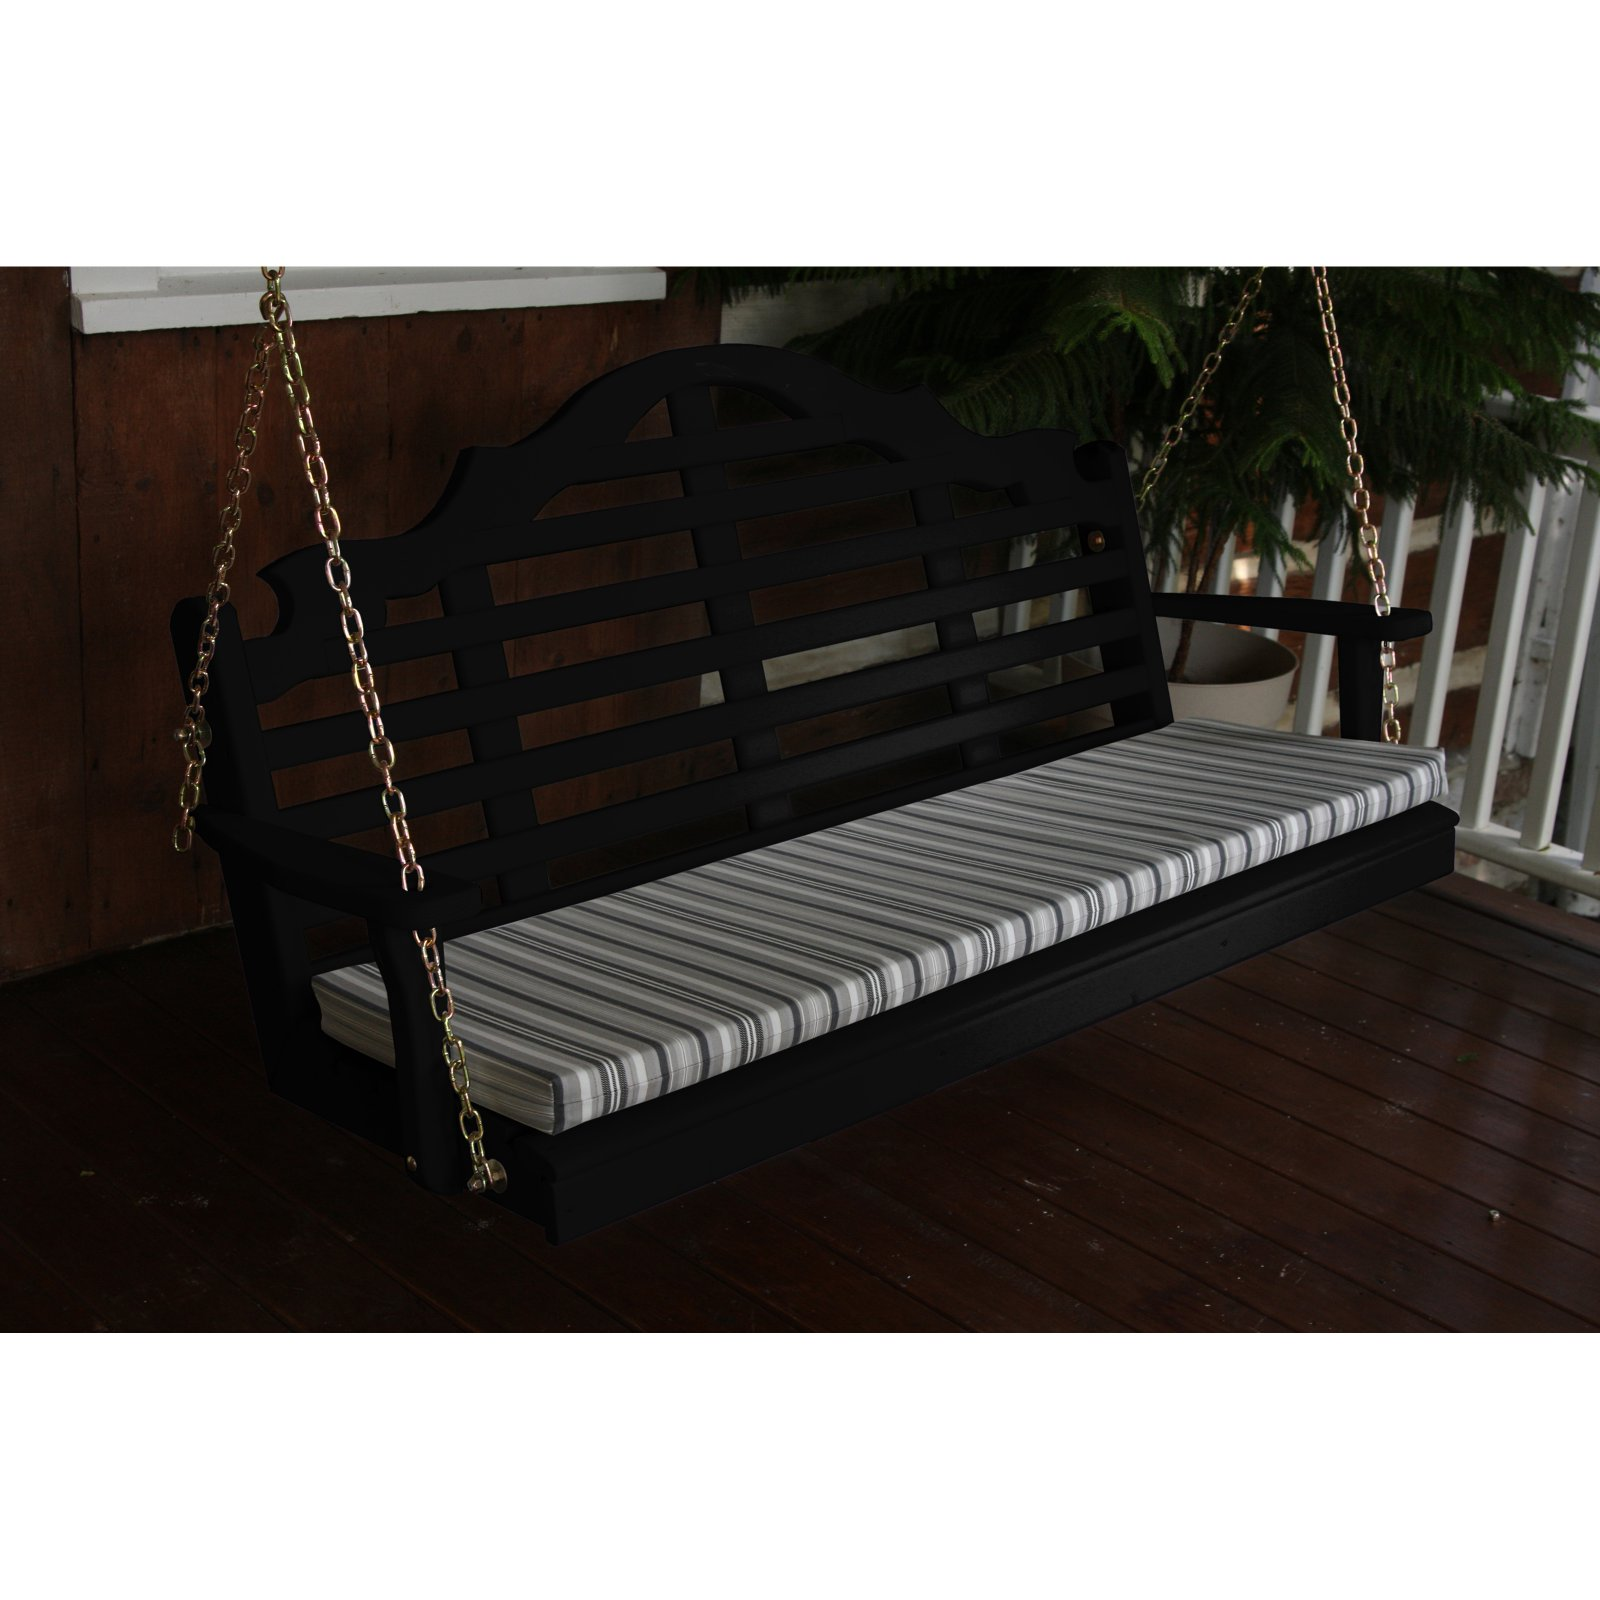 A & L Furniture Yellow Pine Marlboro Porch Swing